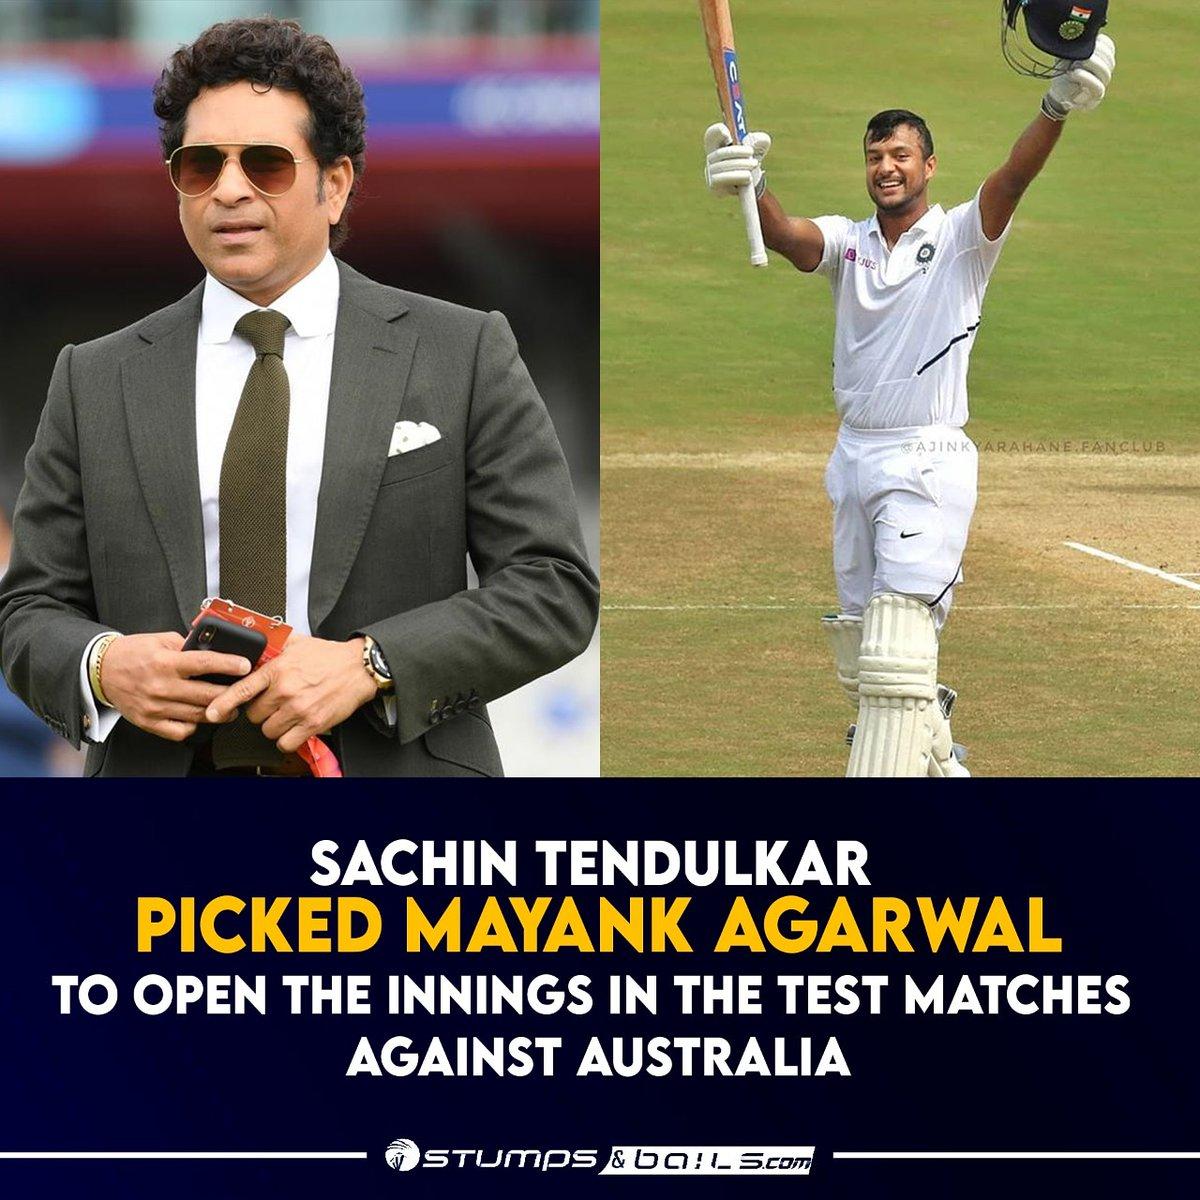 @sachin_rt pick's India's opener for the #Testseries  Follow us @stumpnbails #INDvsAUS #Indiancricketer #Indiatoaustralia #IndianCricketTeam #Indianteam #SachinTendulkar #MayankAgarwal #Indiatourofaustralia2020 #Indiatourofaustralia #Cricket #Cricketmatch #Cricketindia